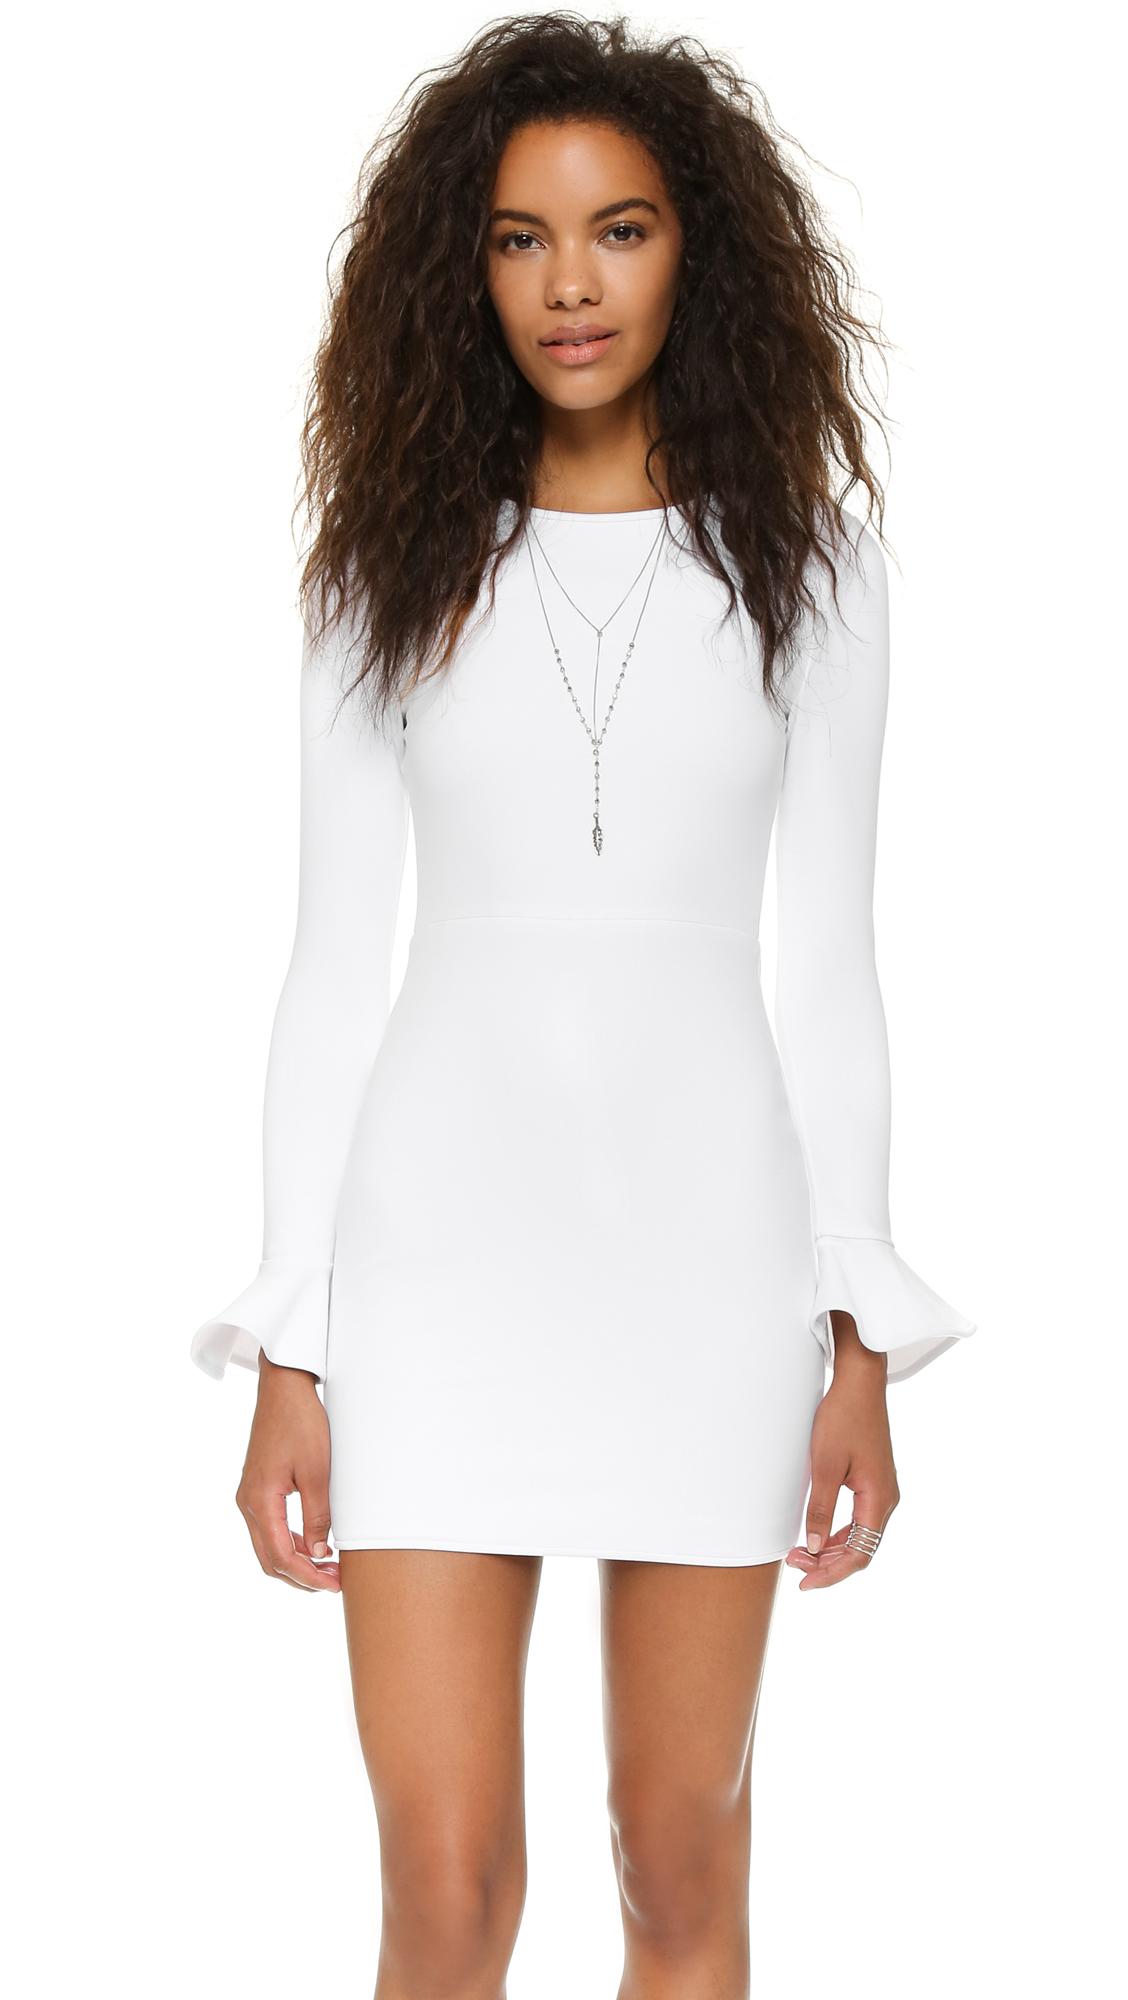 Black Halo Hampton Dress - White